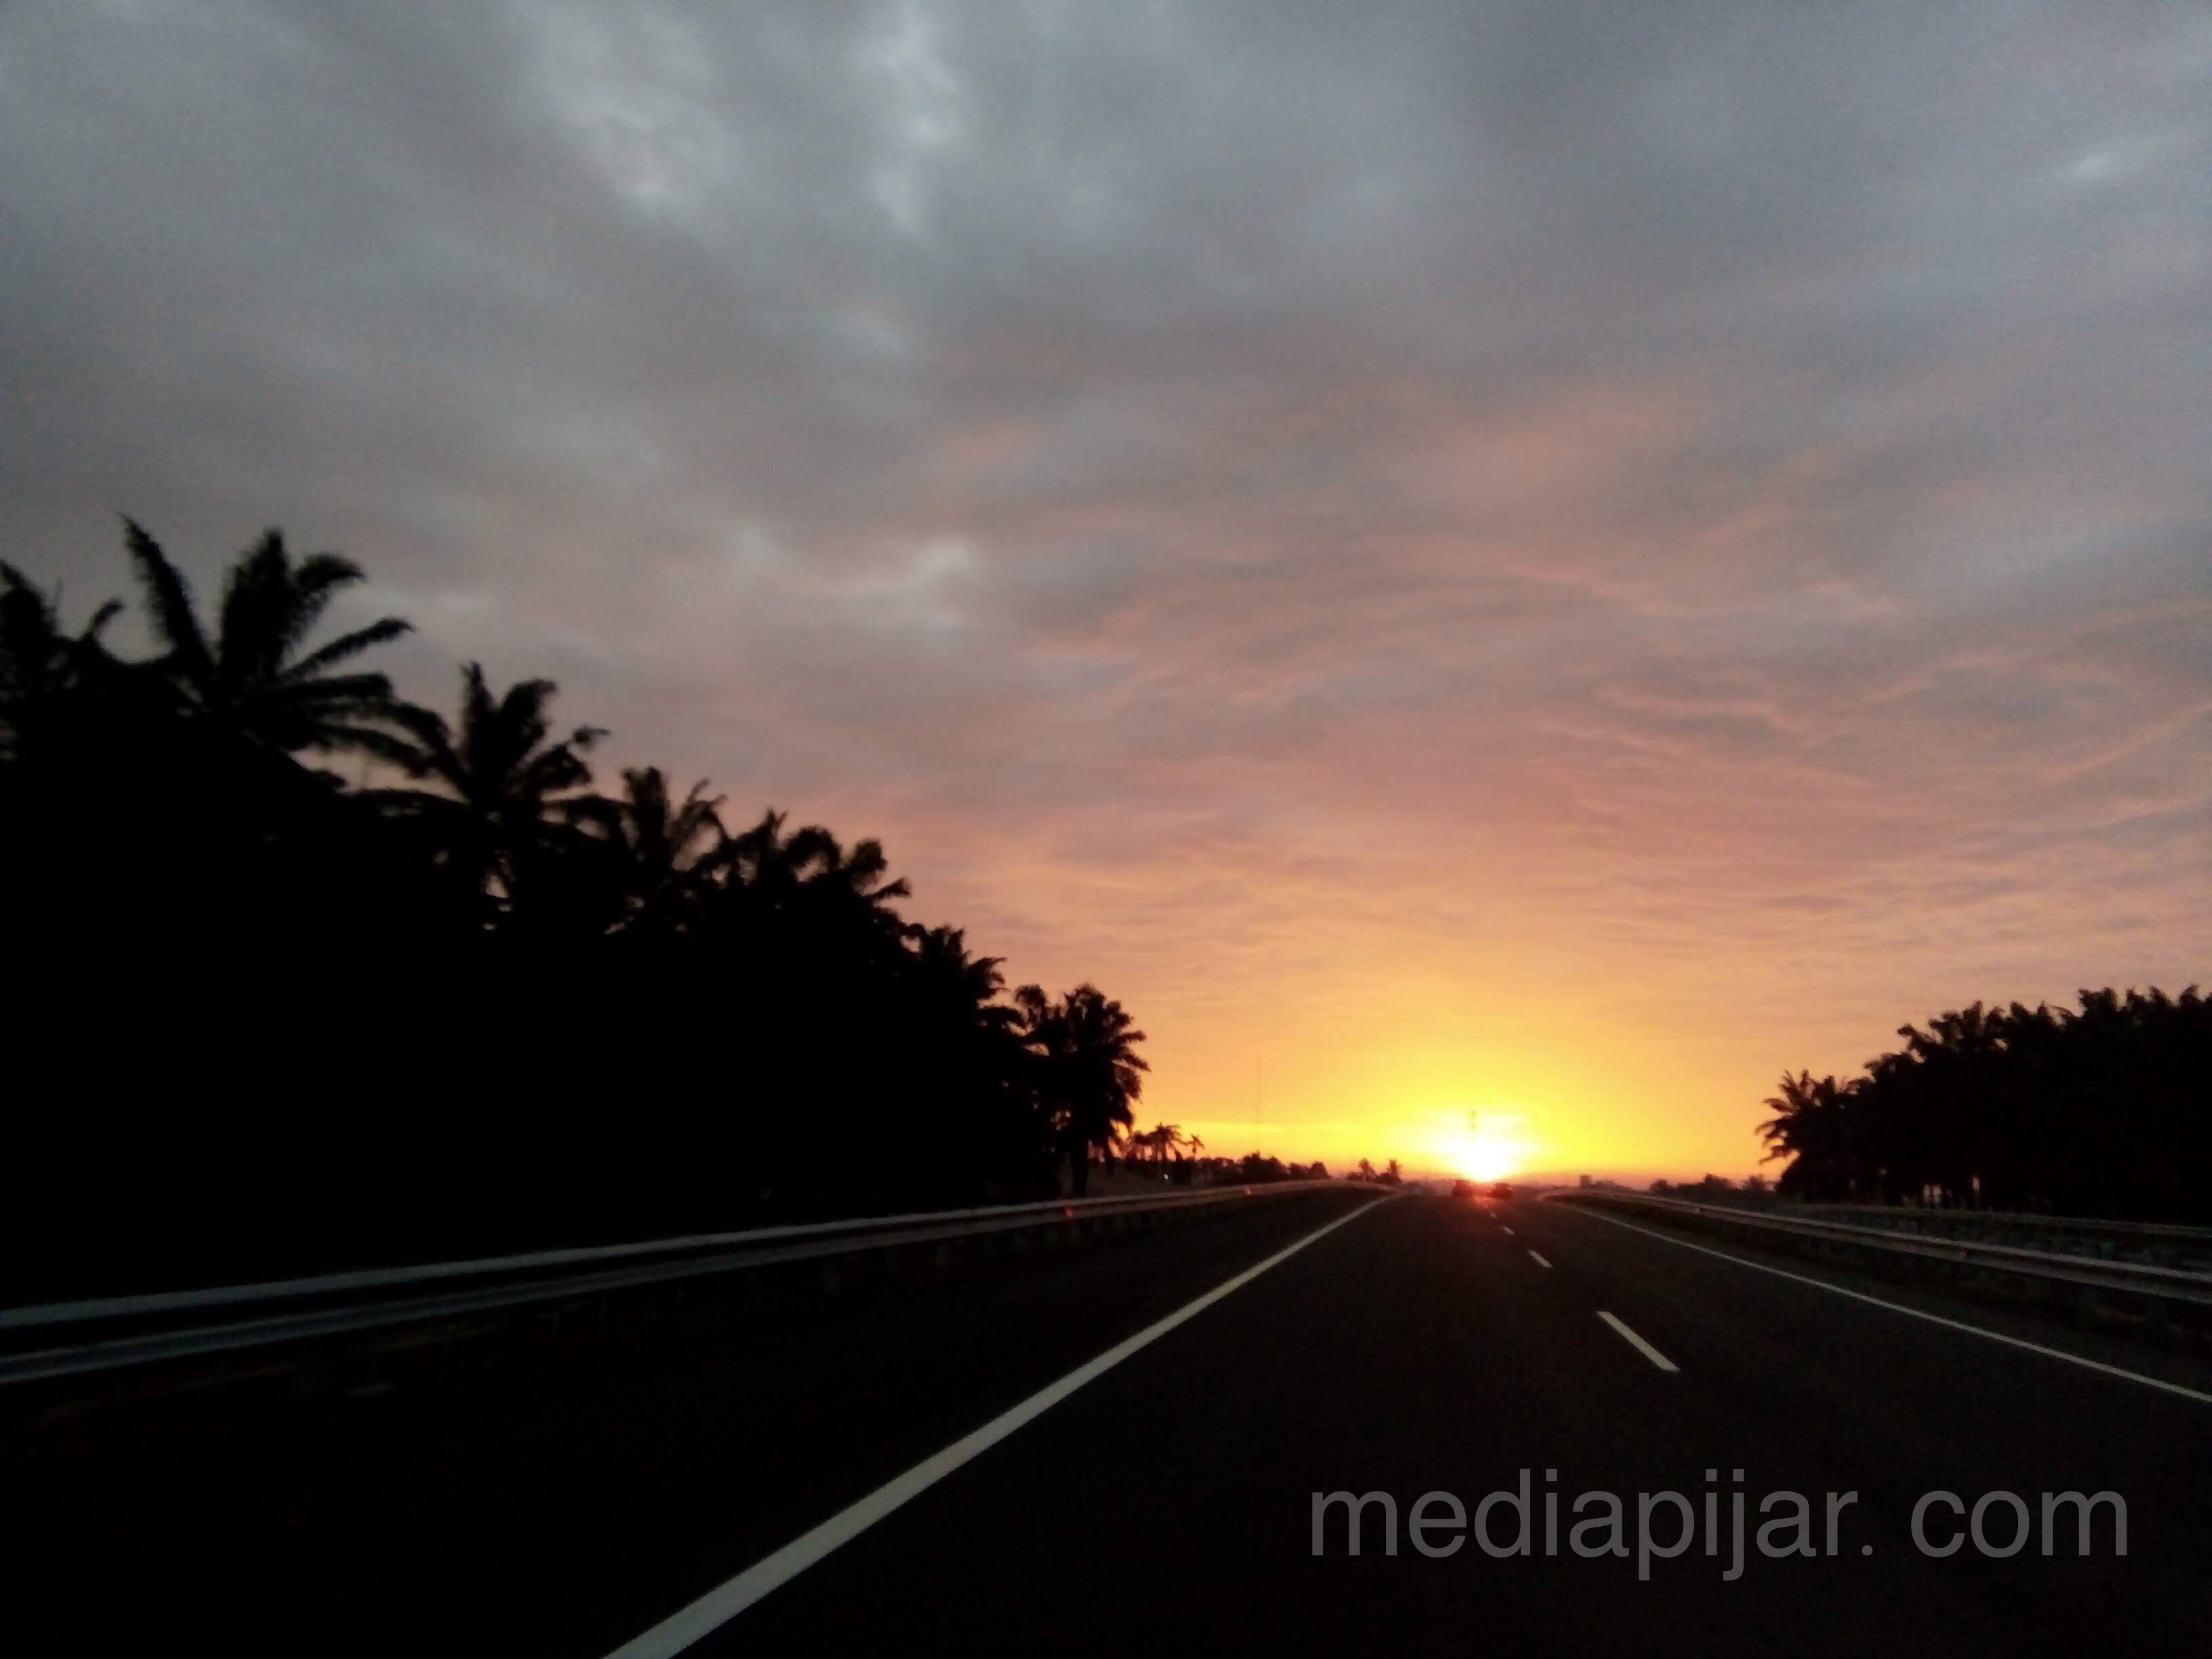 """Senja menyapa pertanda malam pun tiba"" Fotografer: Talitha Nabilah"